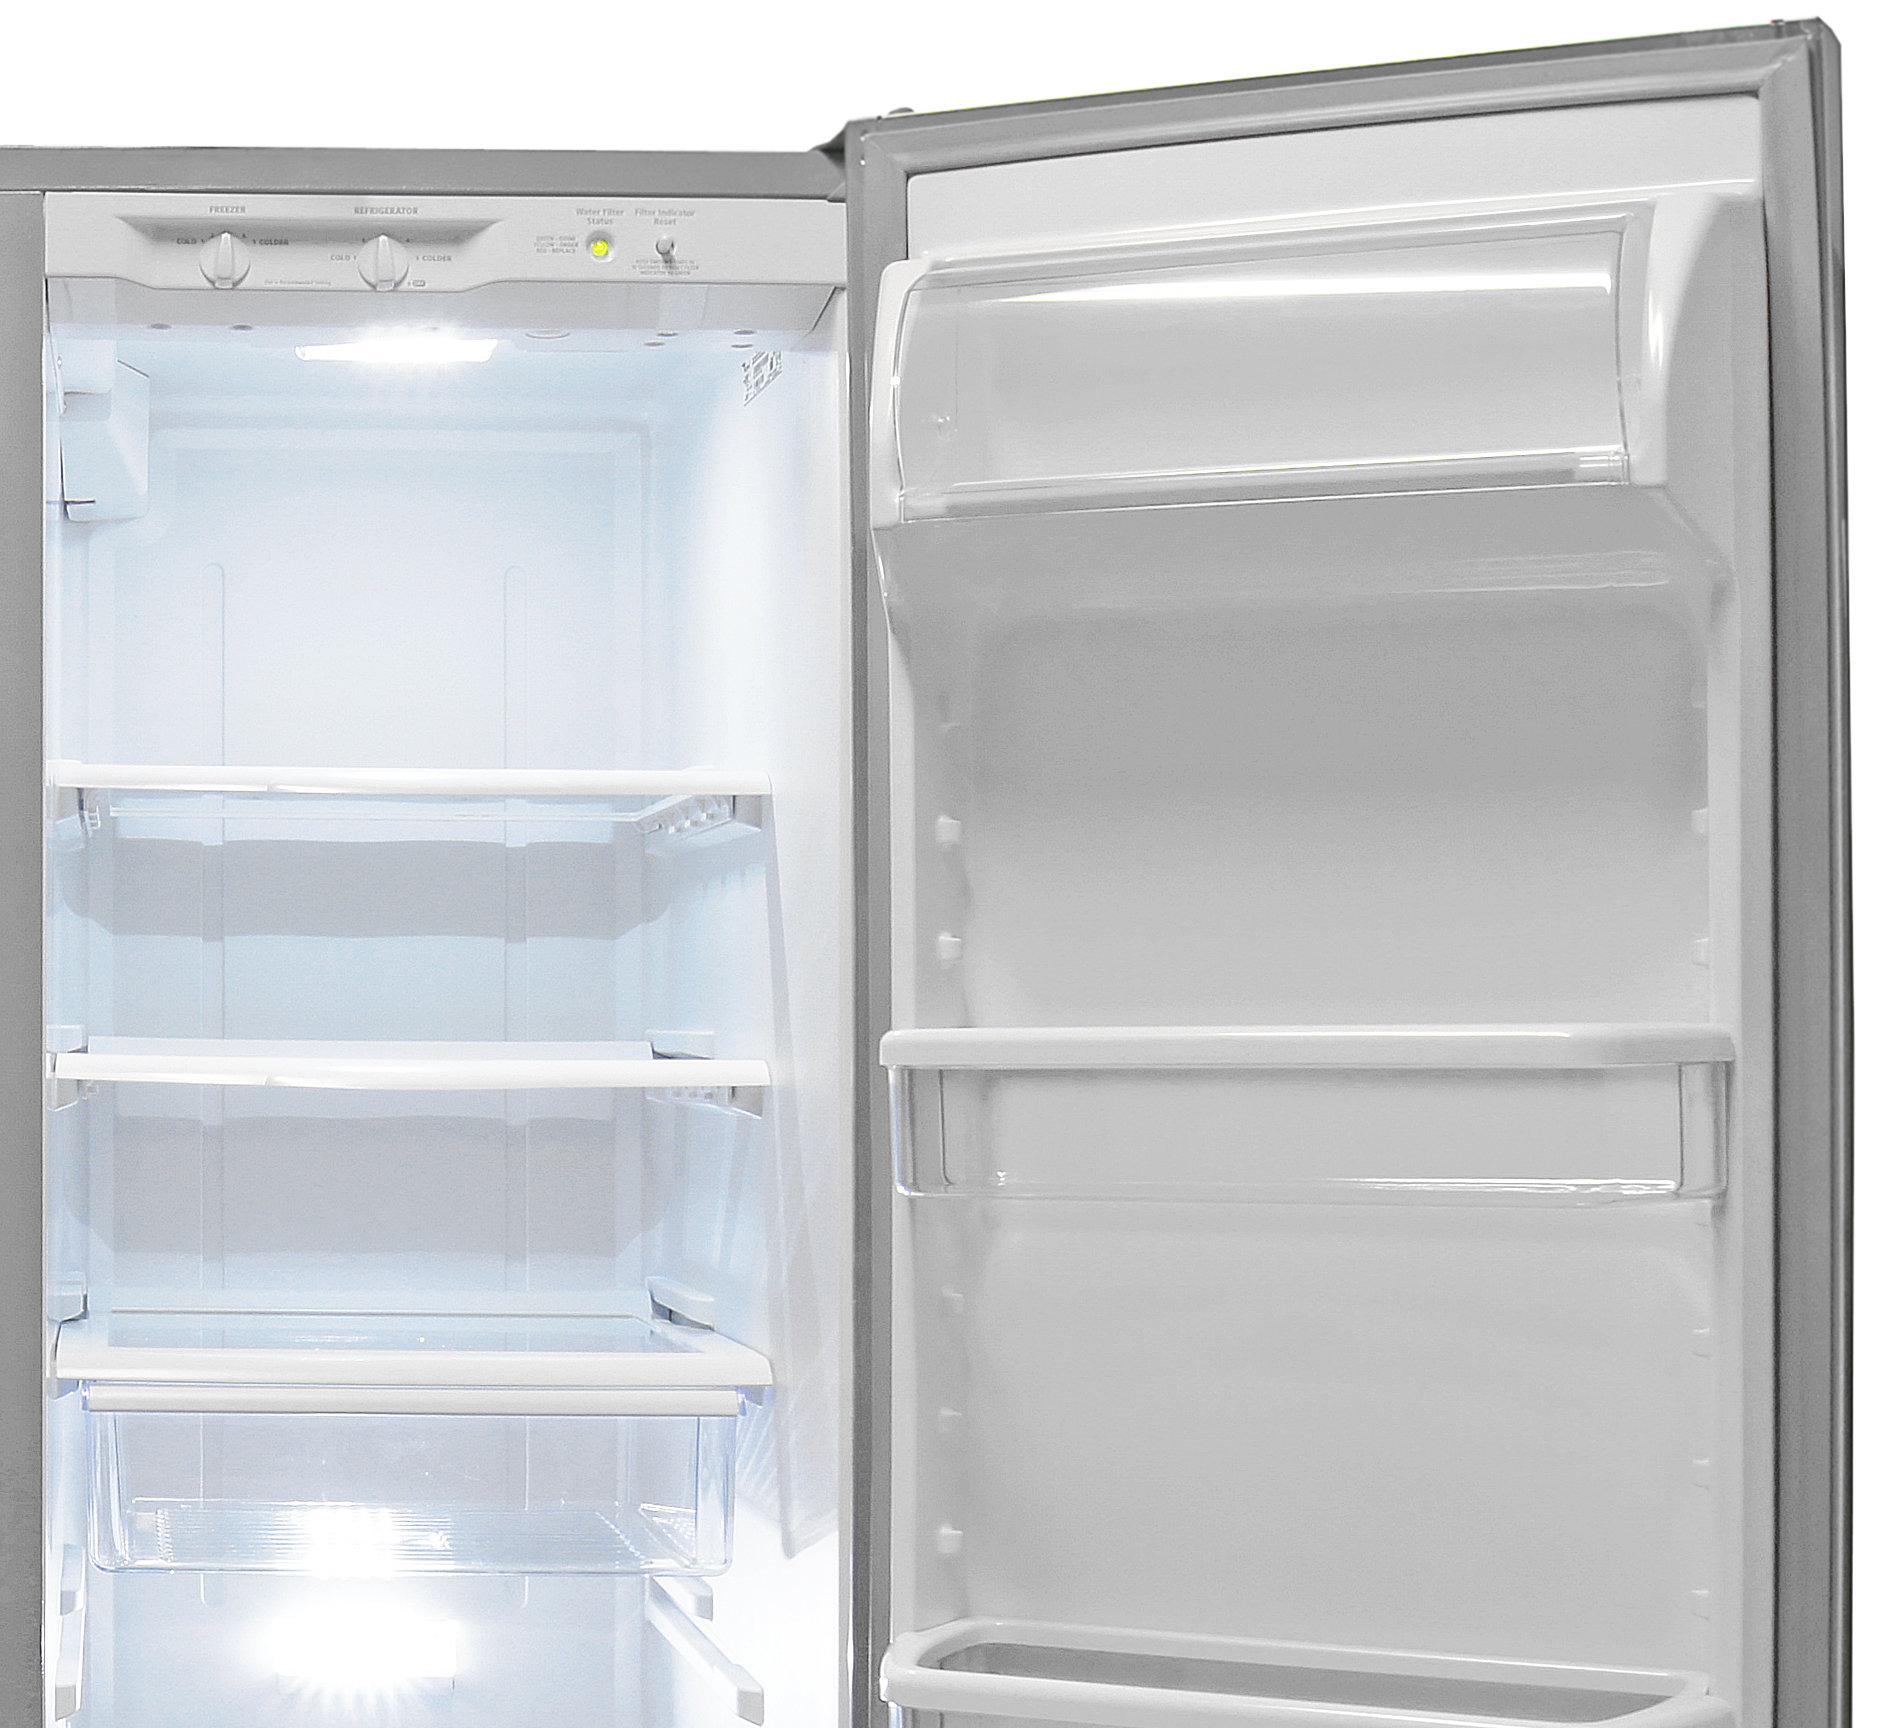 The top of the Whirlpool WRS325FDAM's fridge has plenty of storage for even taller groceries.